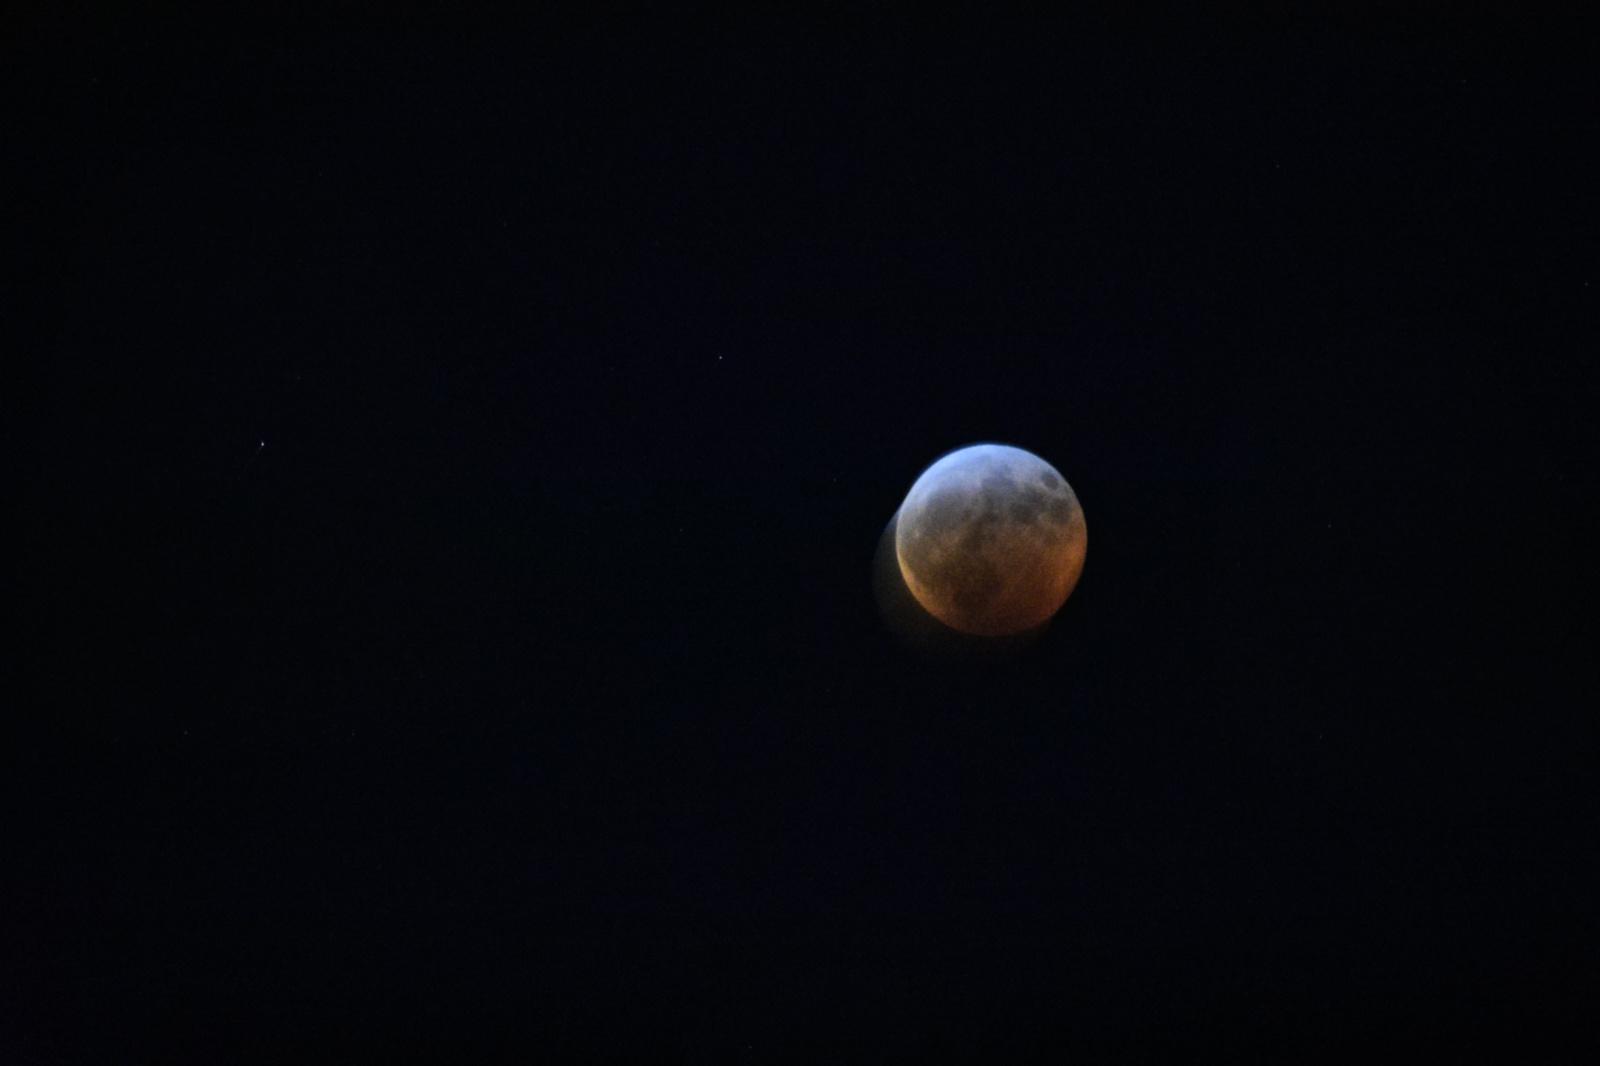 blood moon january 2019 side effects - photo #3